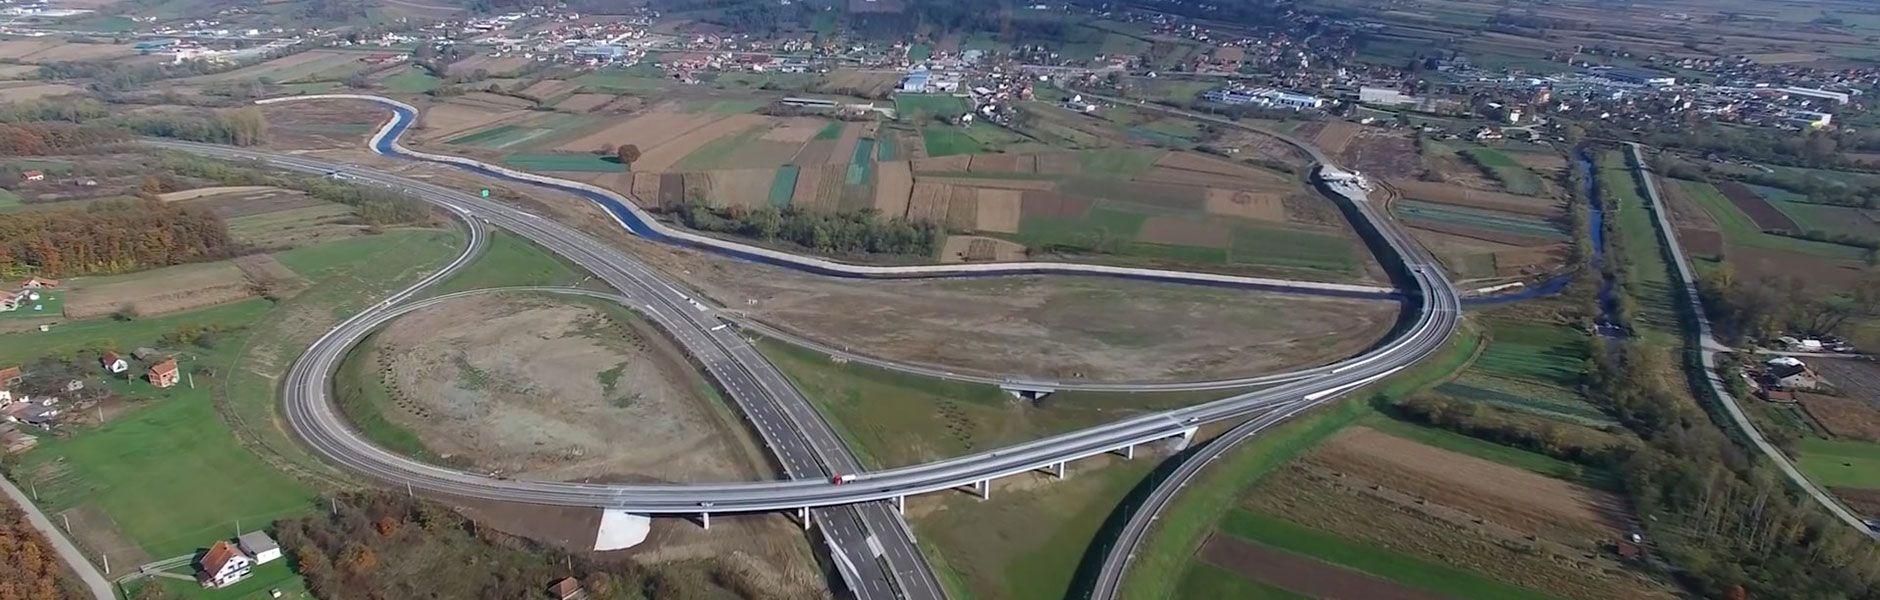 Construction of highway E 763: Belgrade-Juzni Jadran, Republic of Serbia